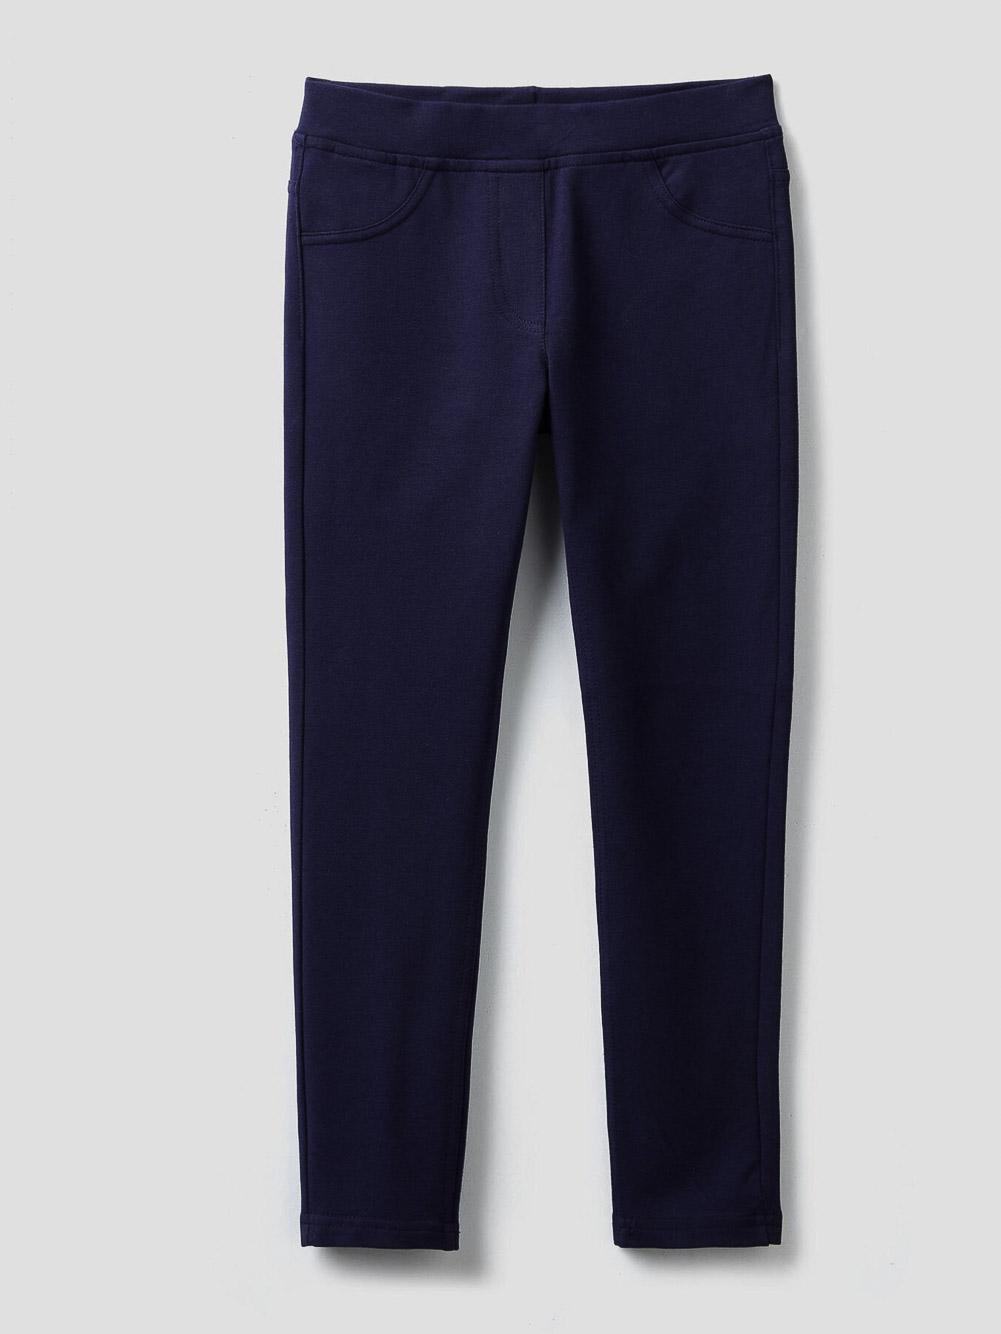 012 BENETTON Παντελόνι super skinny φούτερ 4CY457LY0 20A252